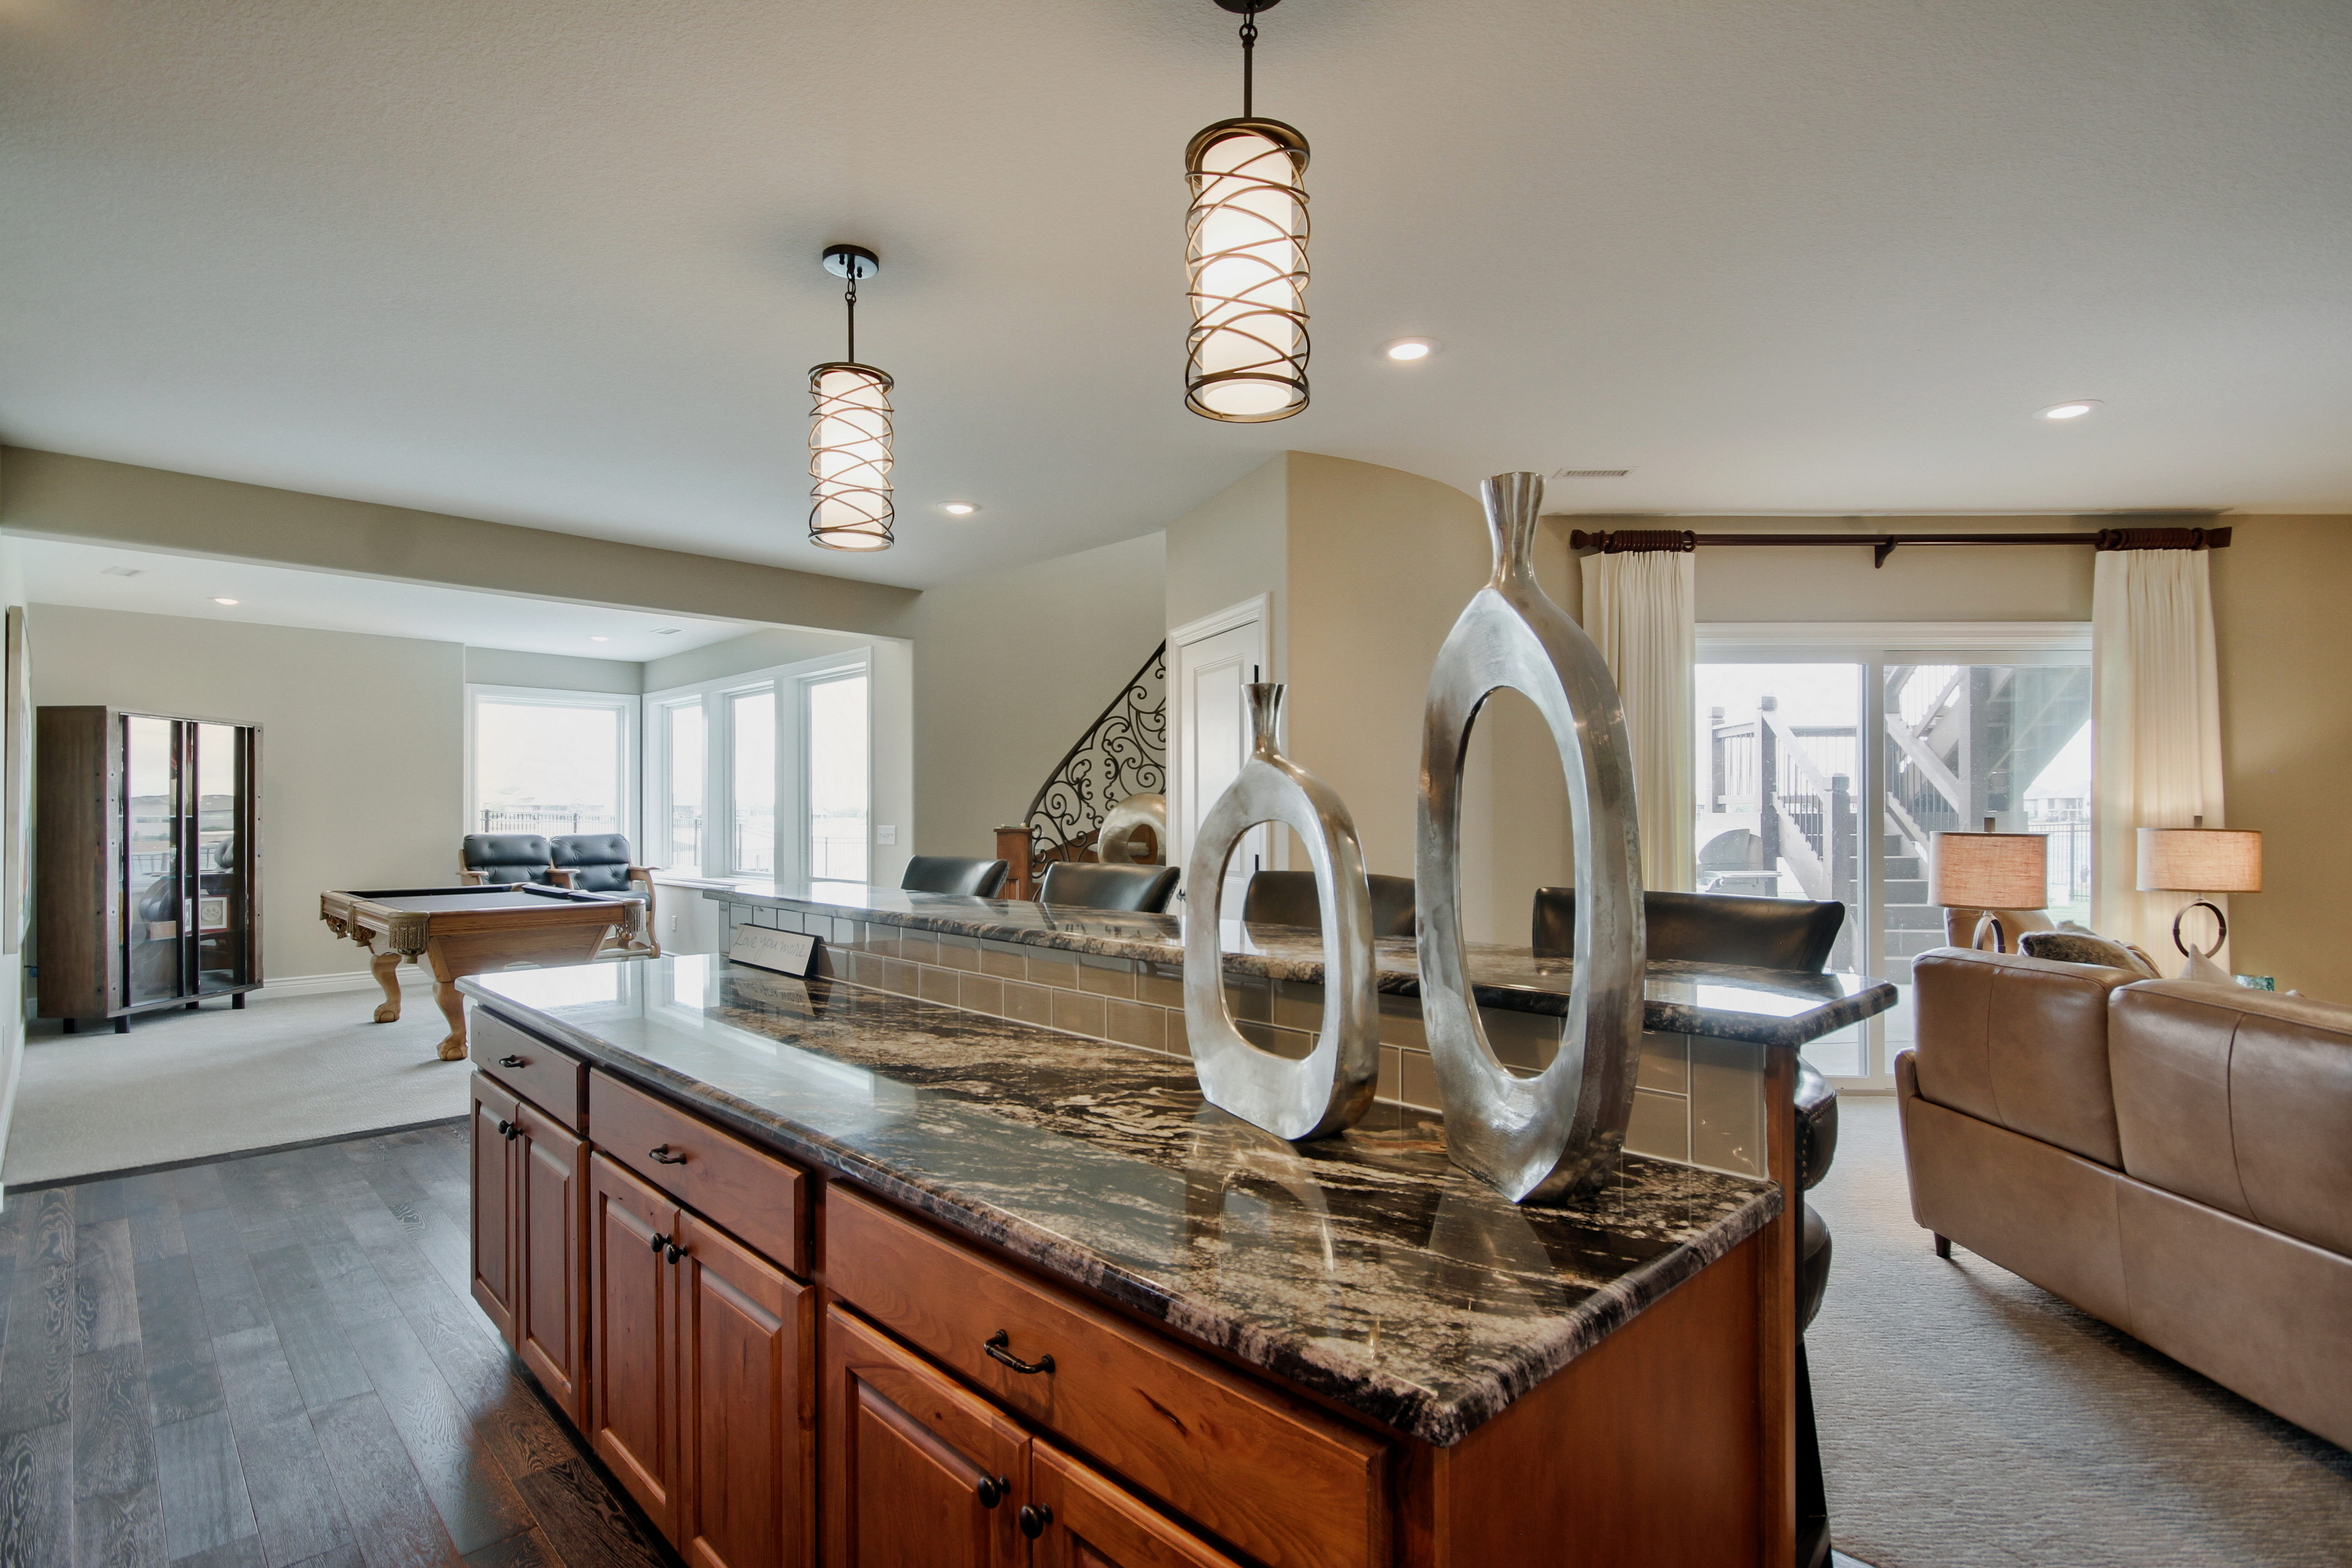 shoreline residence – pam fruhauf interior design